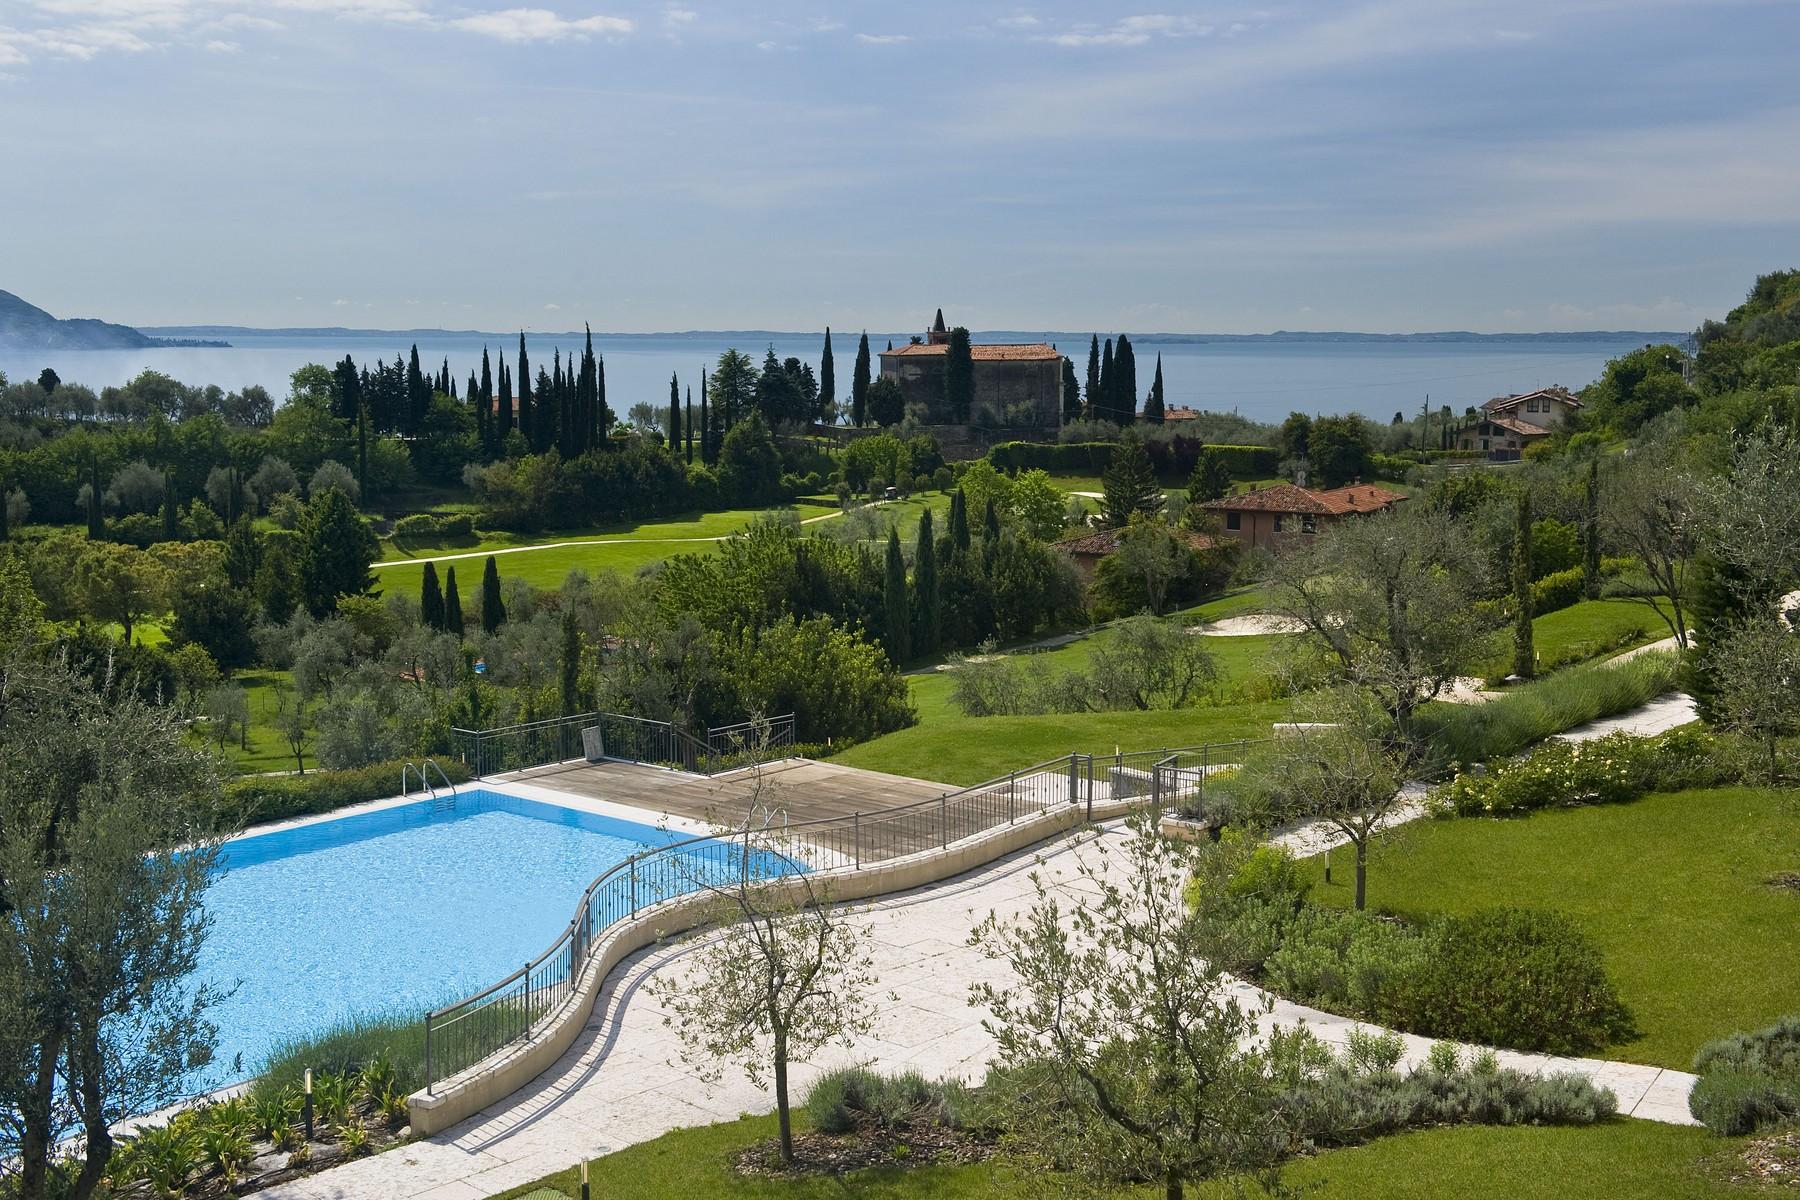 Apartment for Sale at New apartments inside the Bogliaco Golf Resort Via del Golf Toscolano Maderno, Brescia 25088 Italy